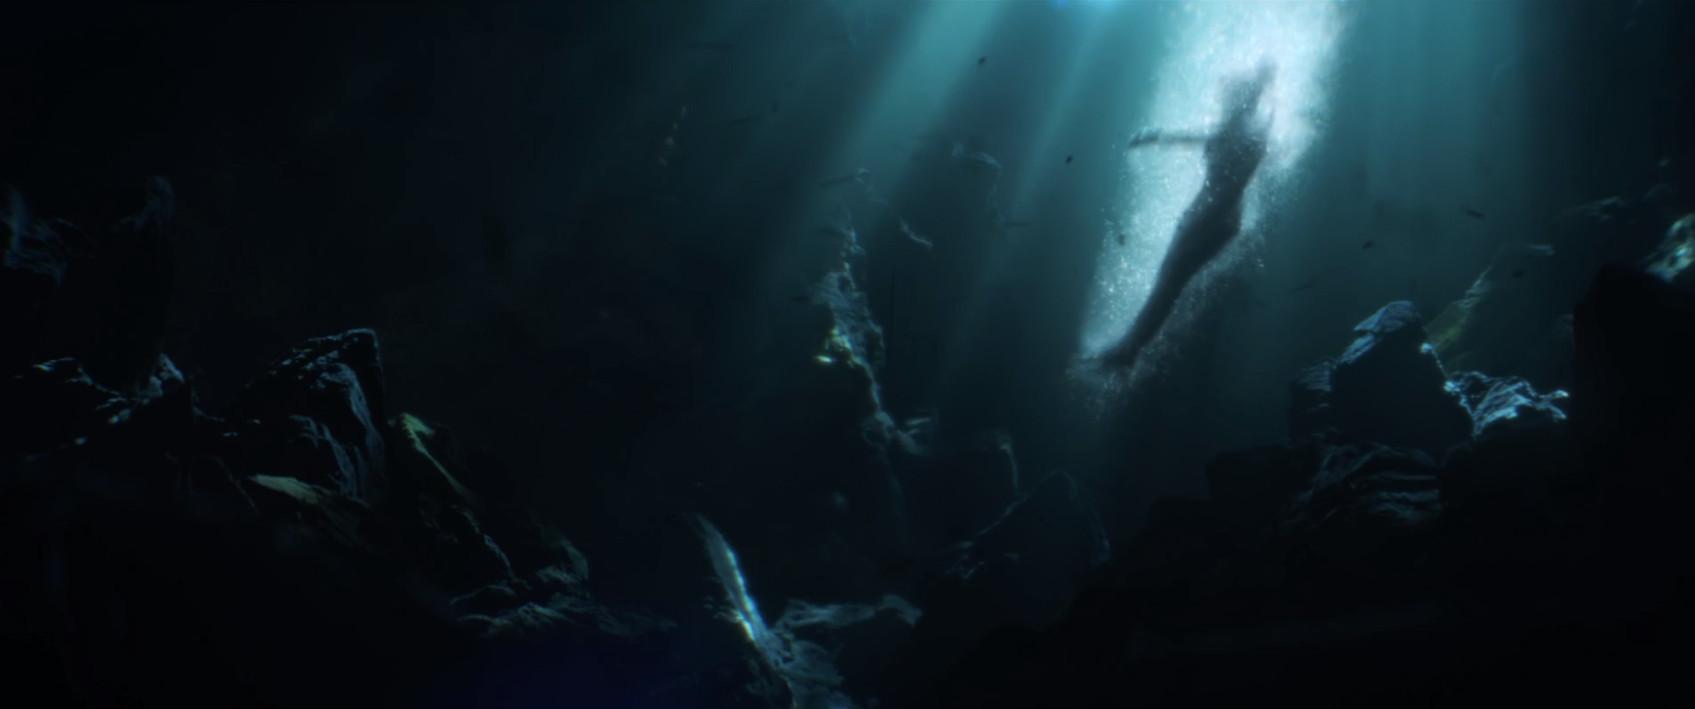 shadow-tomb-raider-end-of-beginning-trailer43